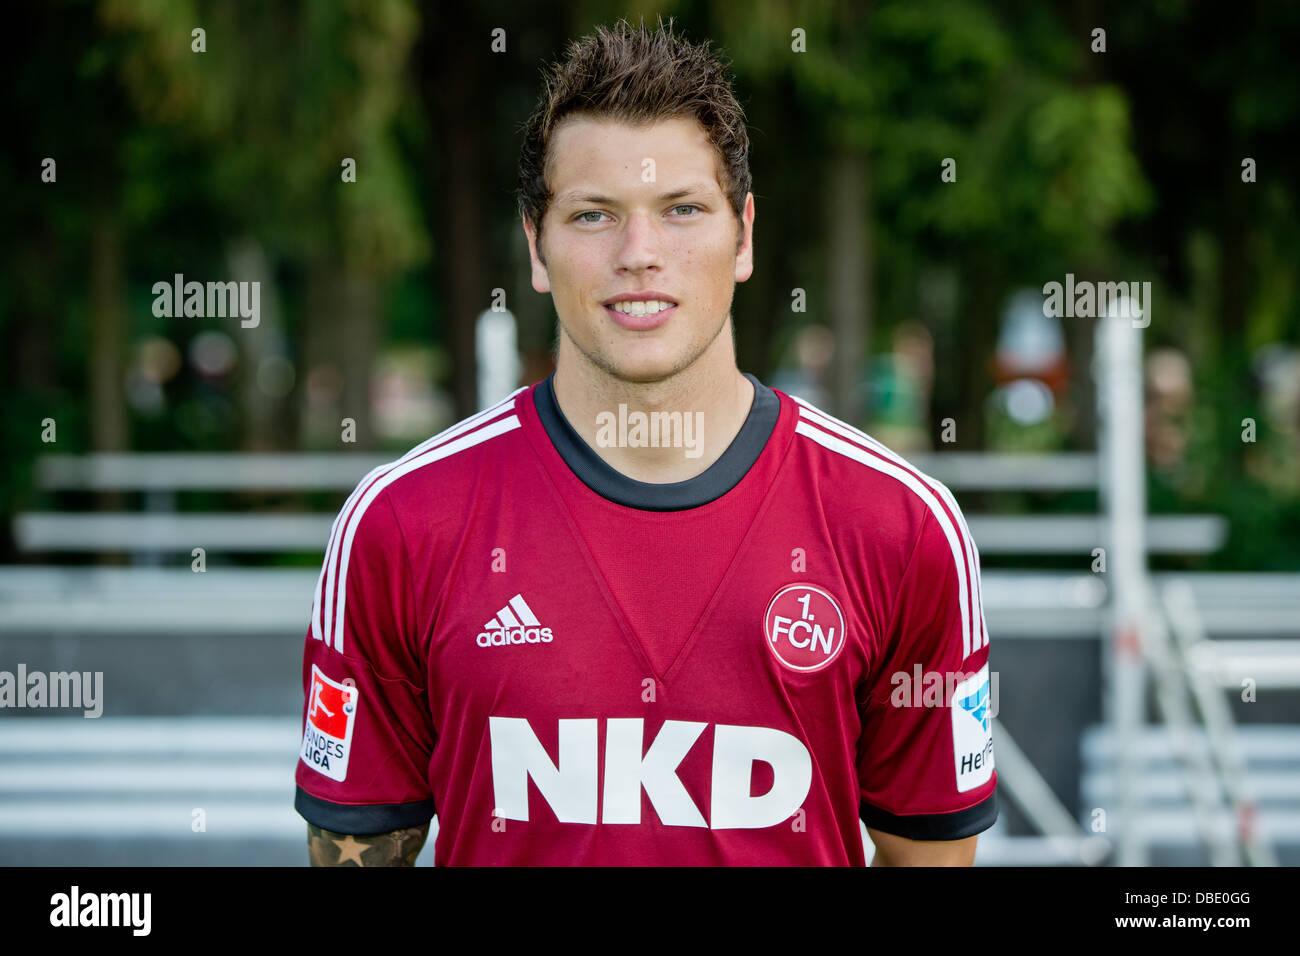 Player Daniel Ginczek of German Bundesliga club 1. FC Nurnberg during the official photocall for the season 2013 - Stock Image